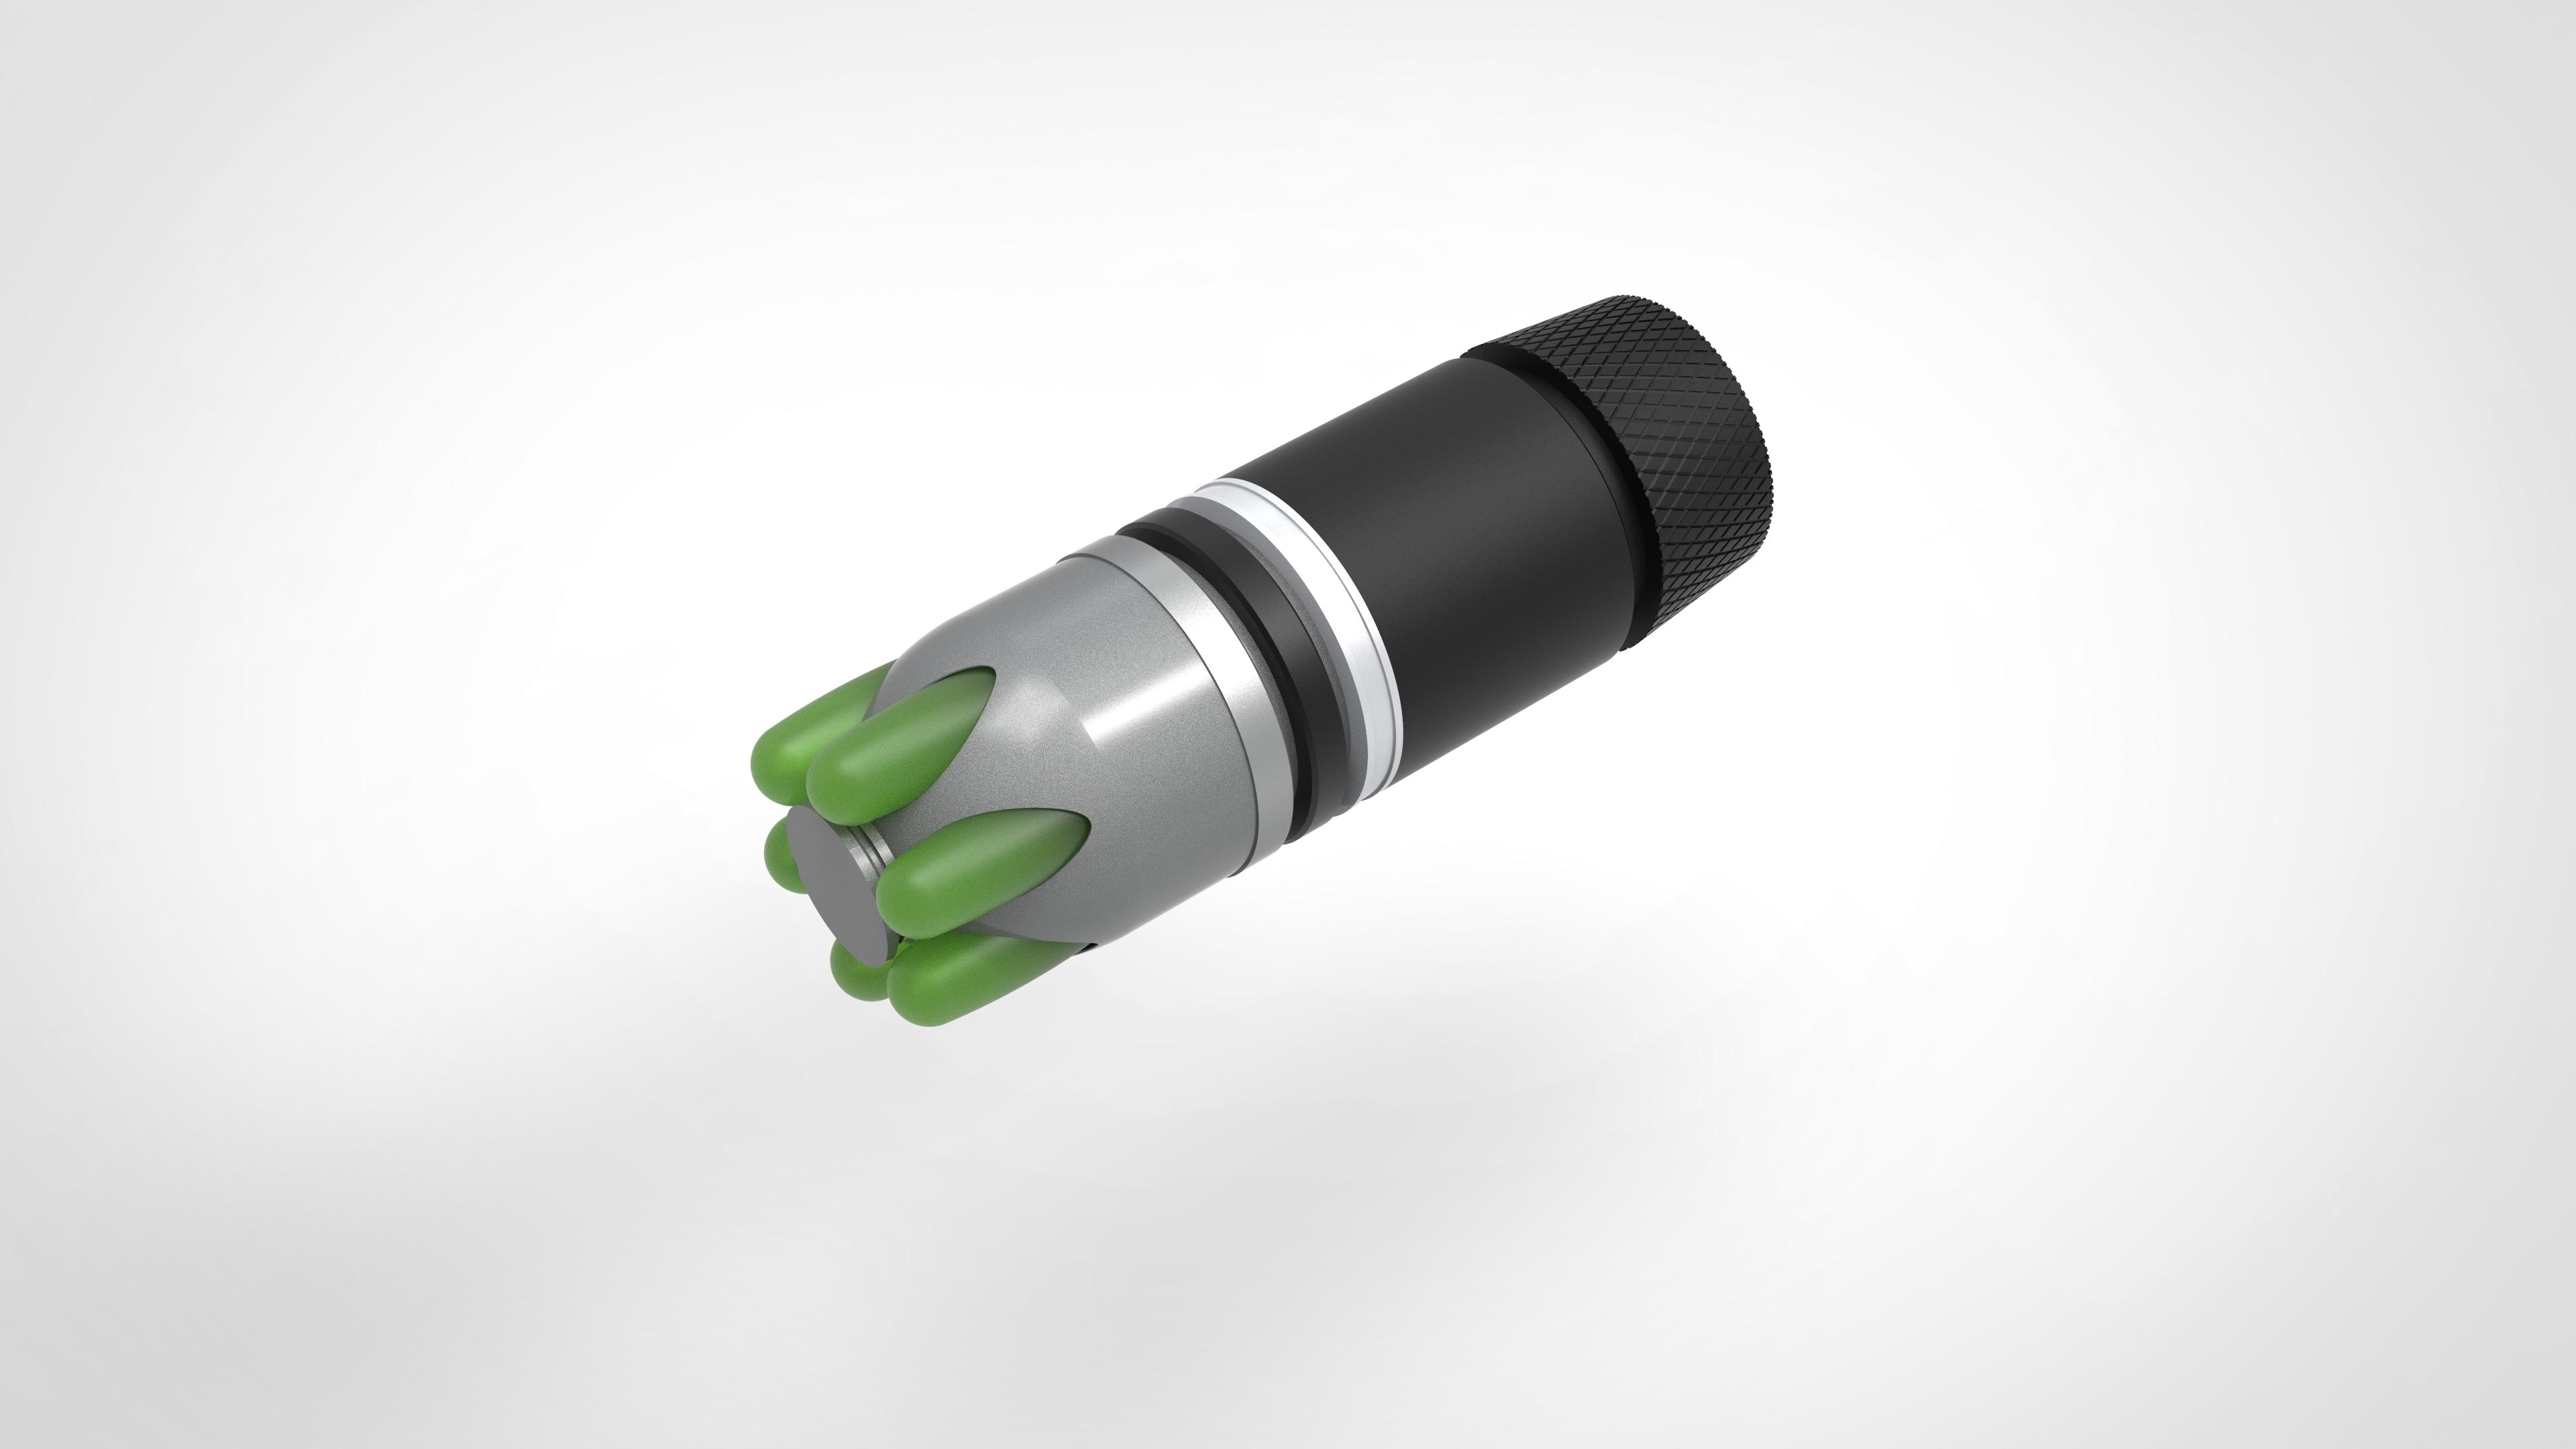 006.jpg Download 3MF file Glue grenade from the video game Batman: Arkham Origins • 3D printer model, vetrock